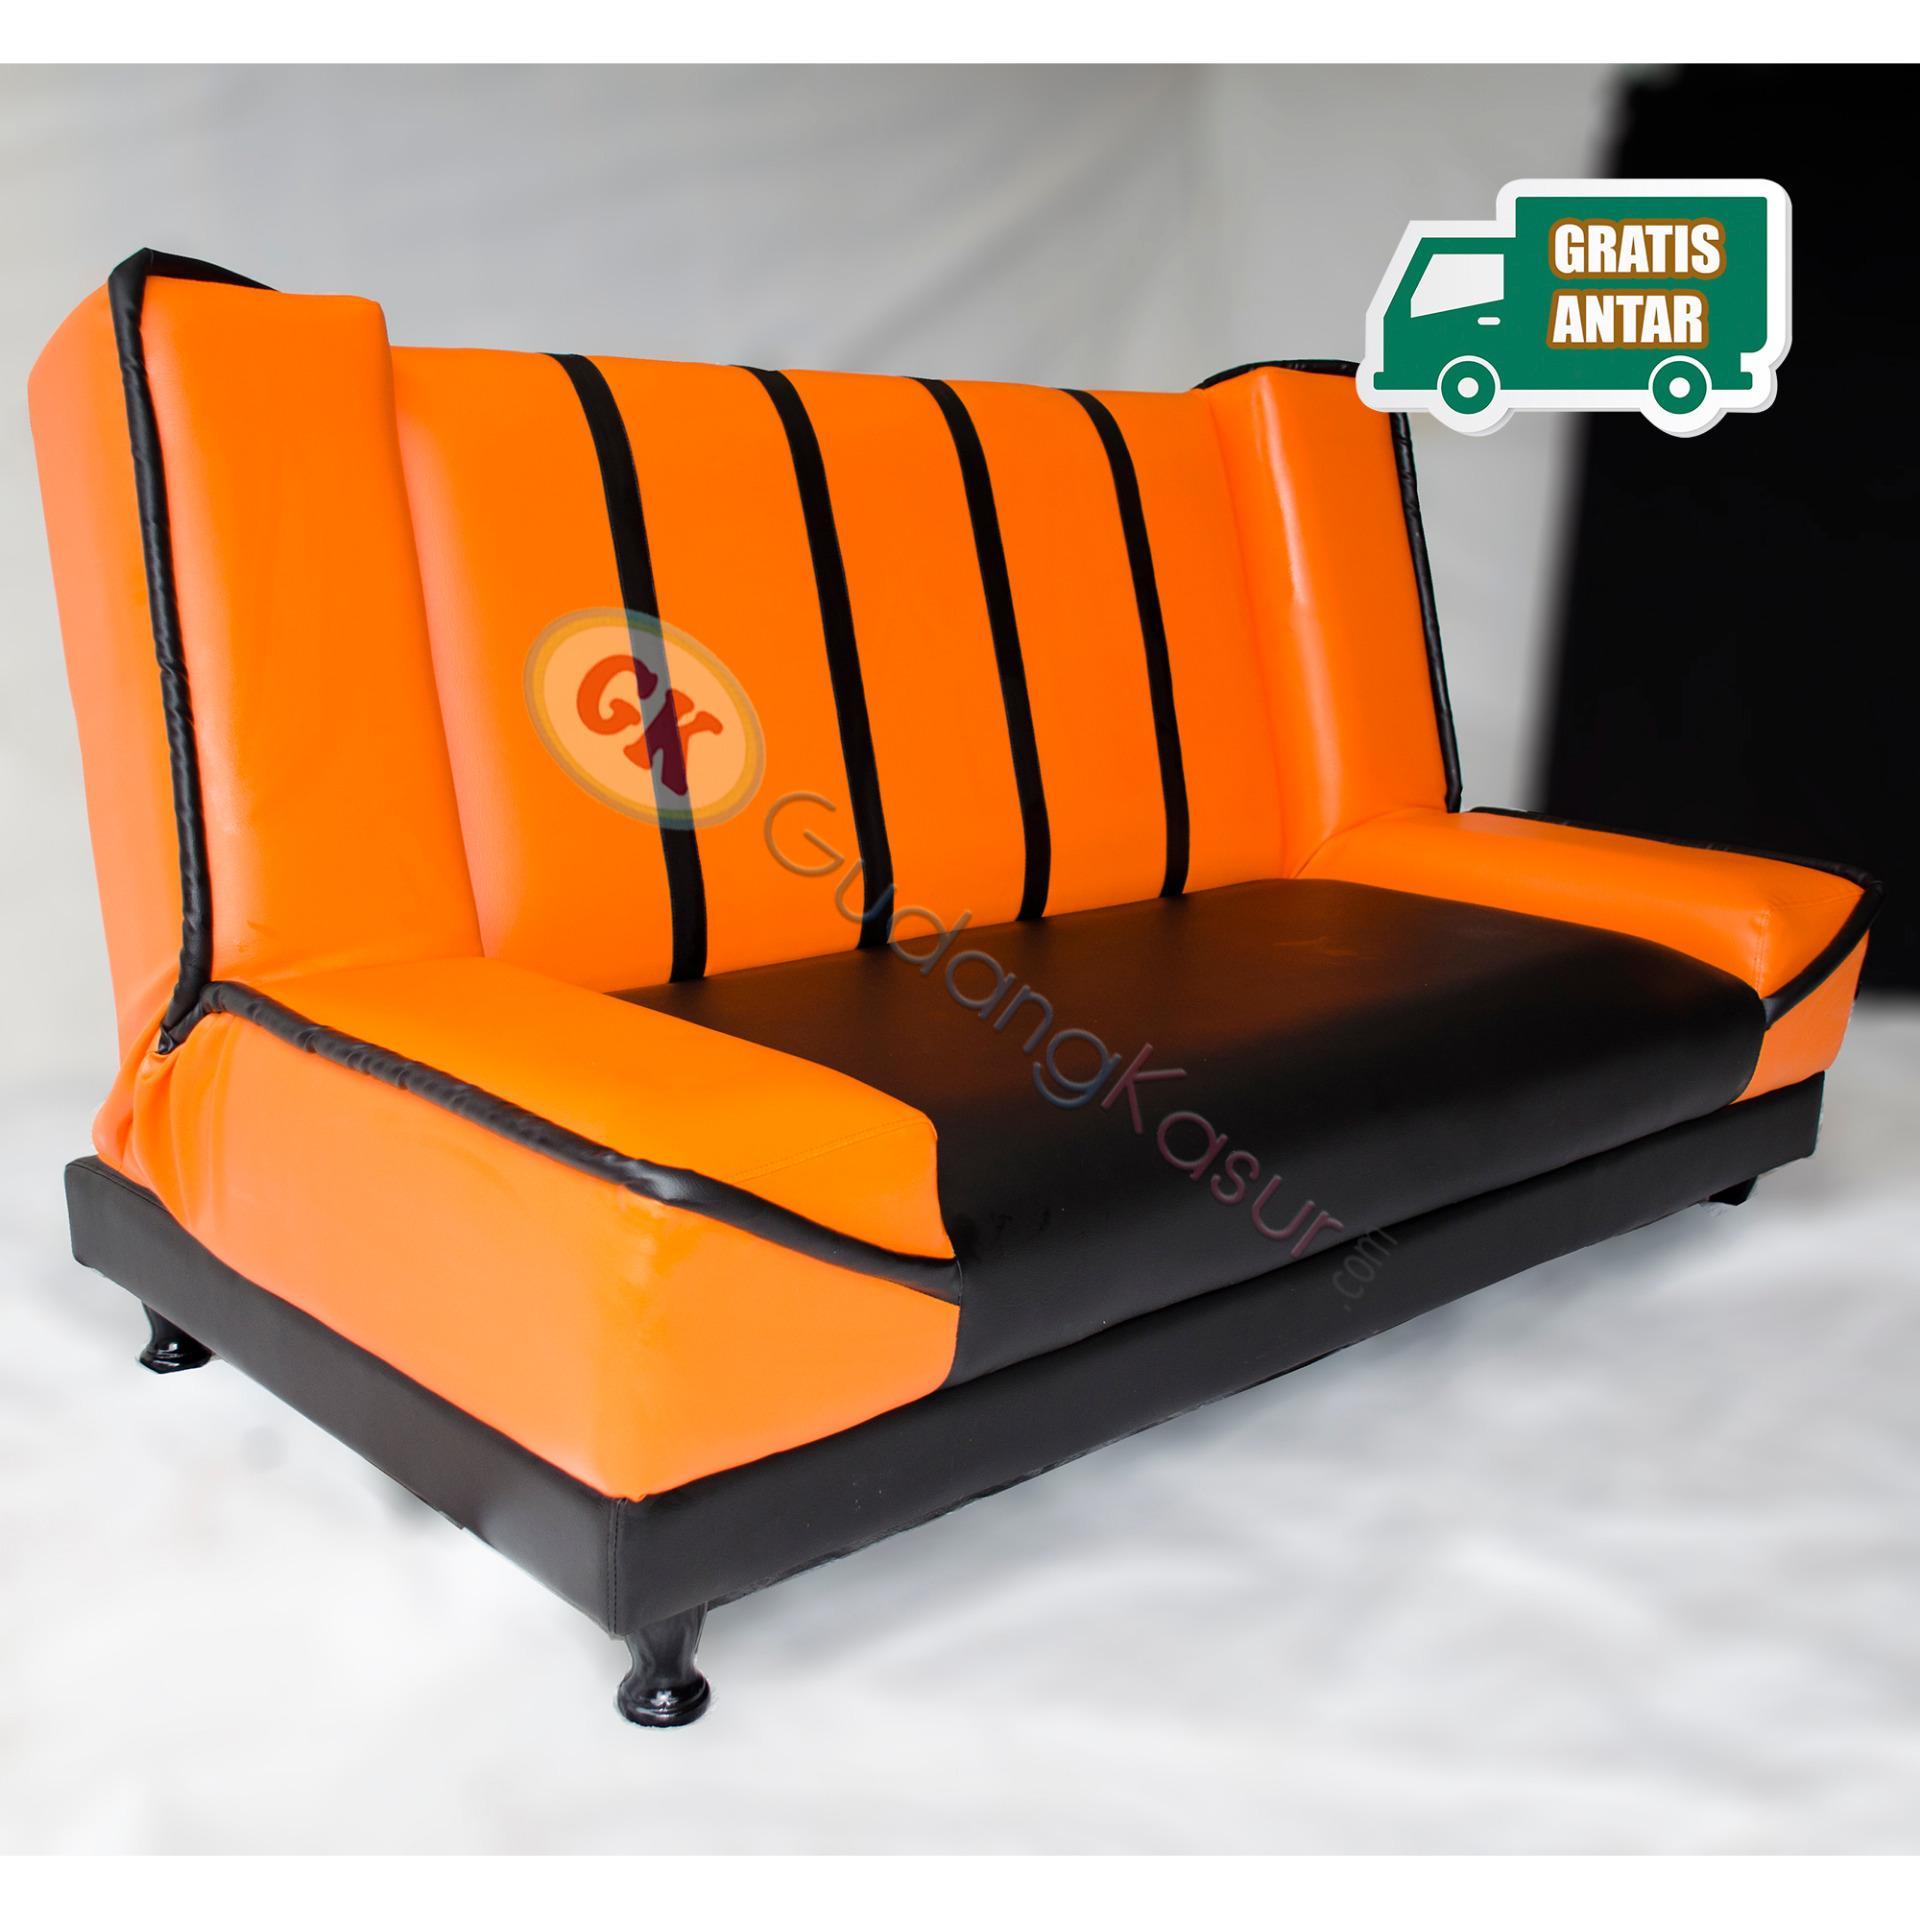 sofabed sofa bed minimalis SB808